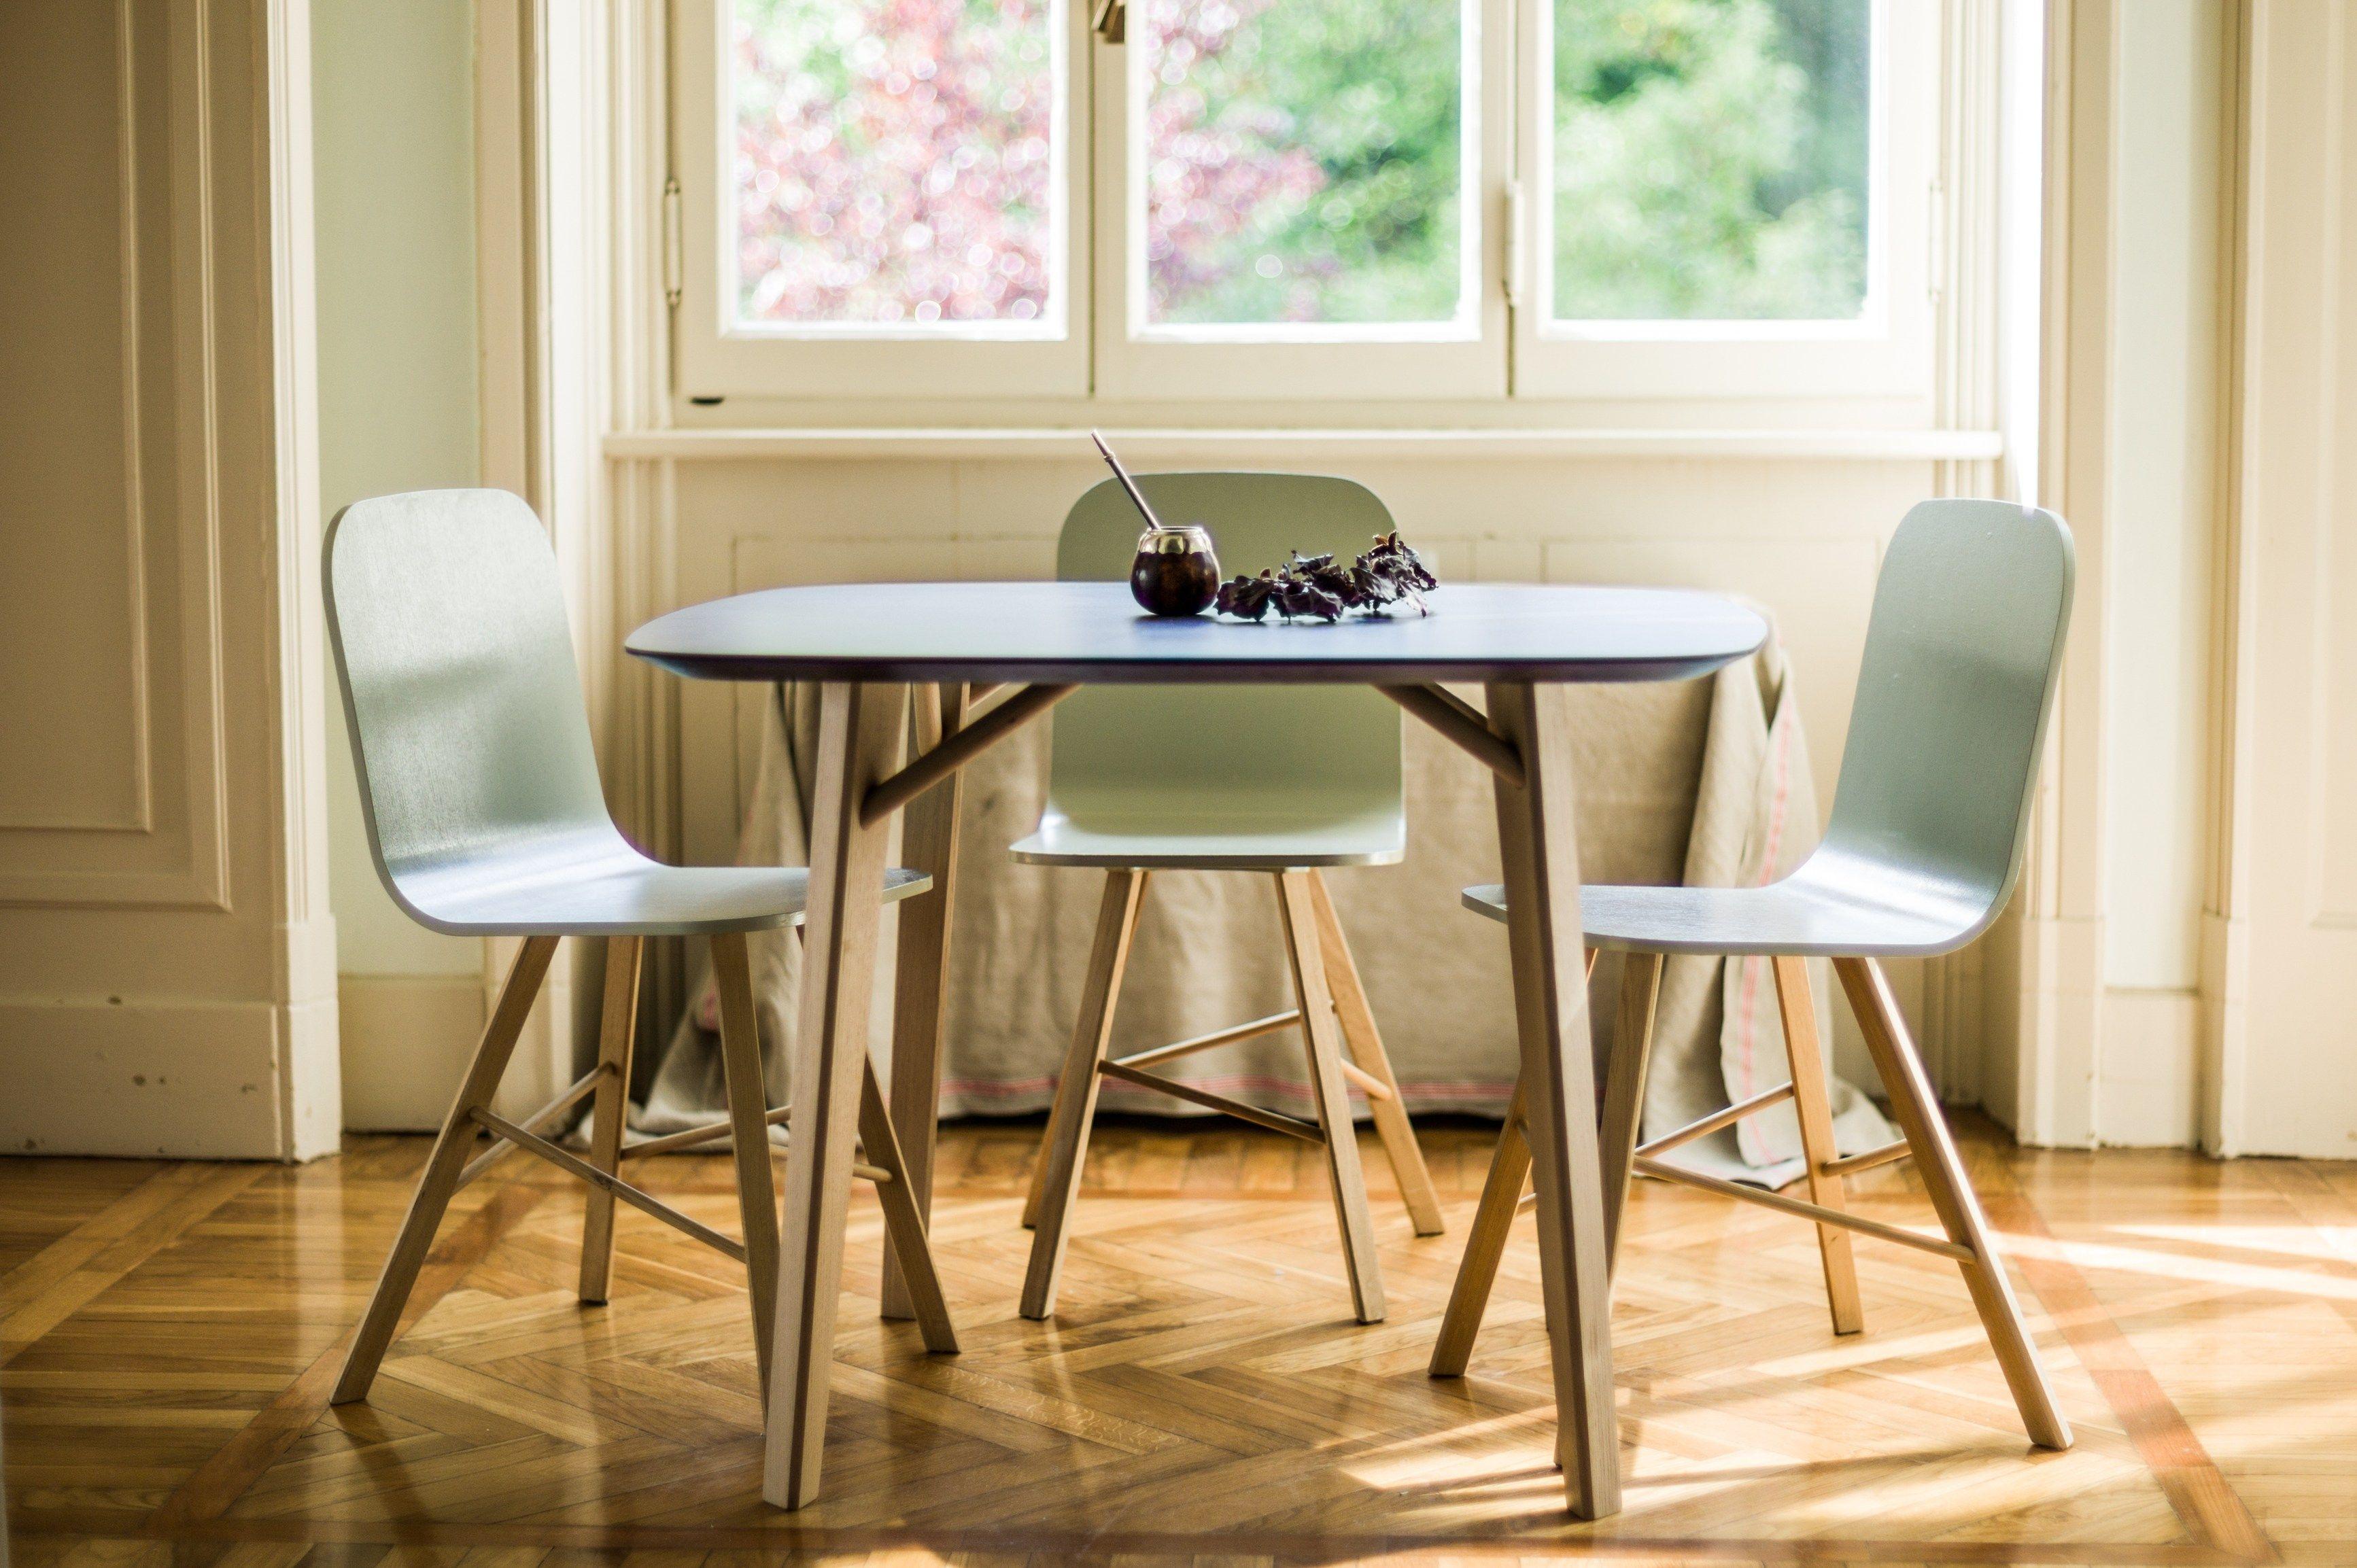 Tavoli da cucina quadrati arredamento tavoli da pranzo | Zenzeroclub